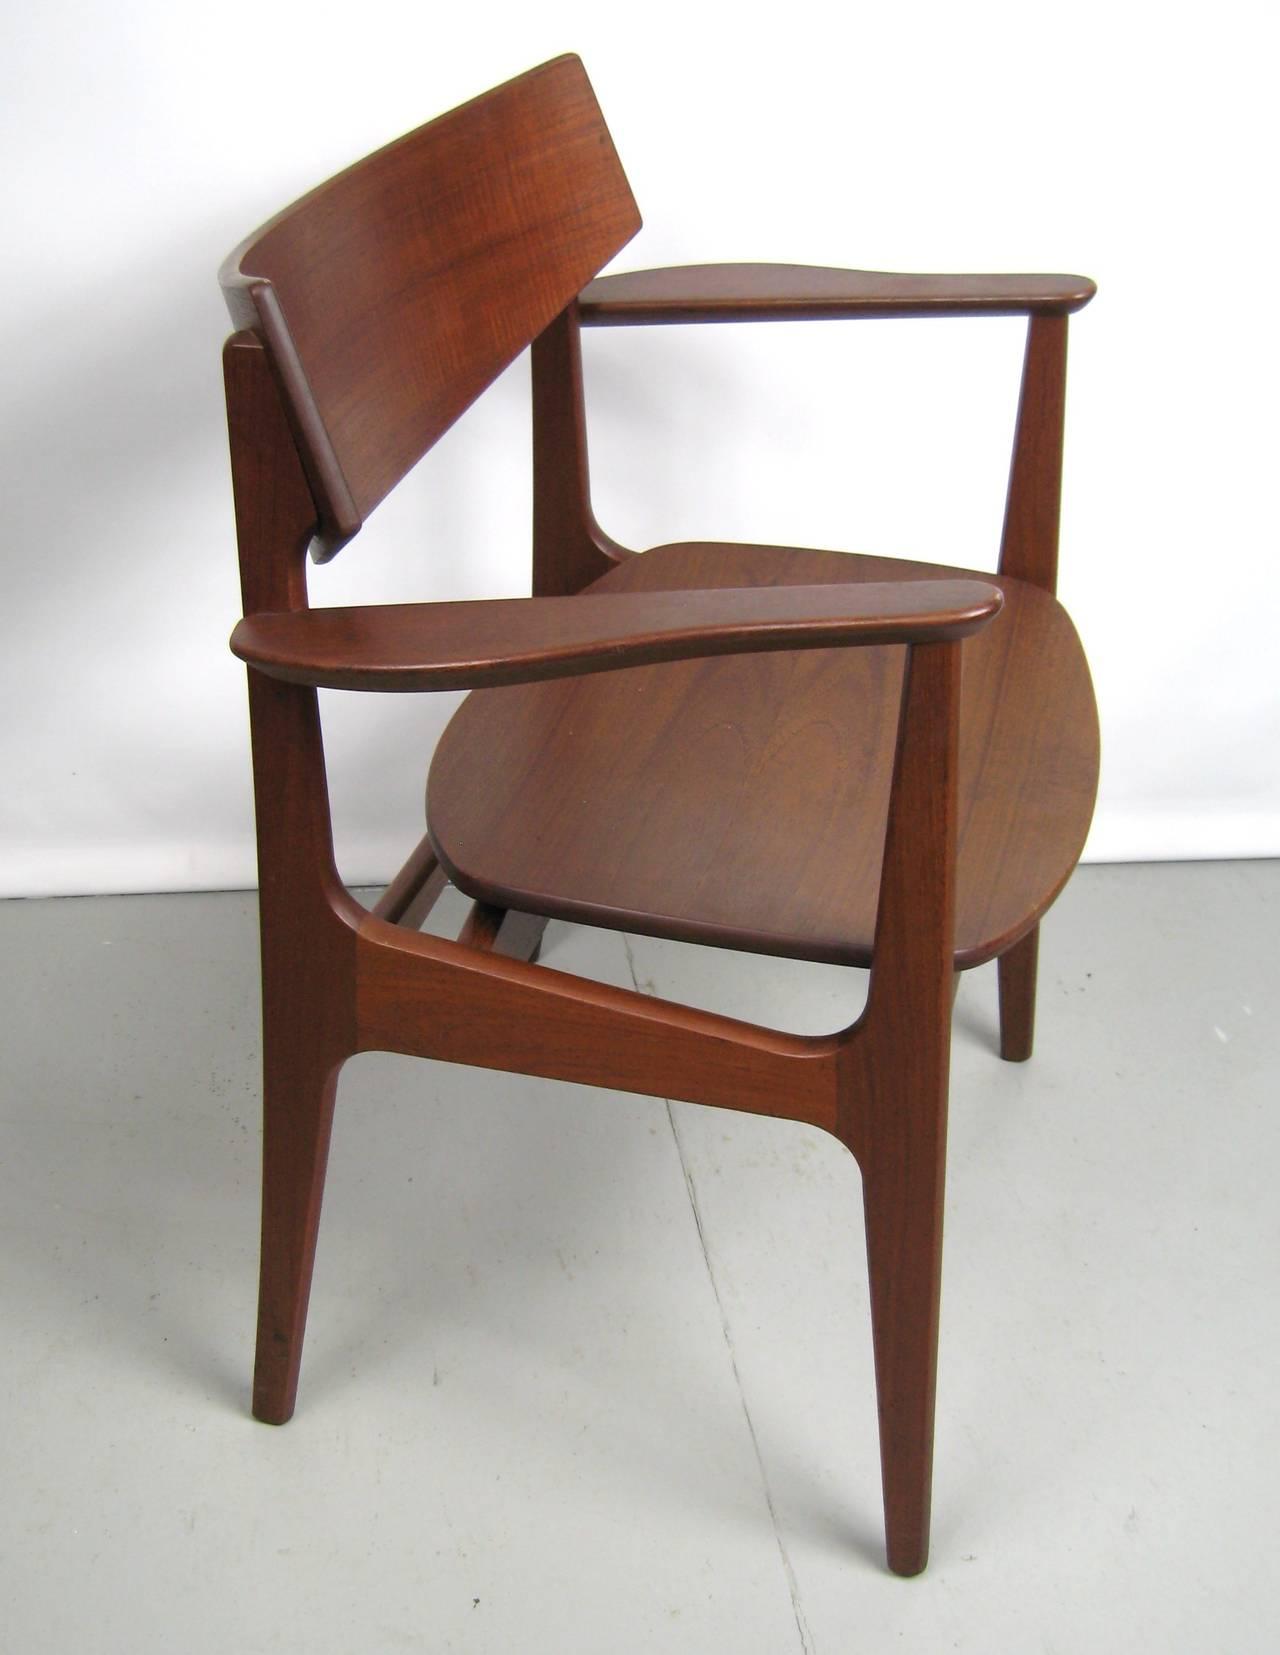 teak chairs dining room photo - 5